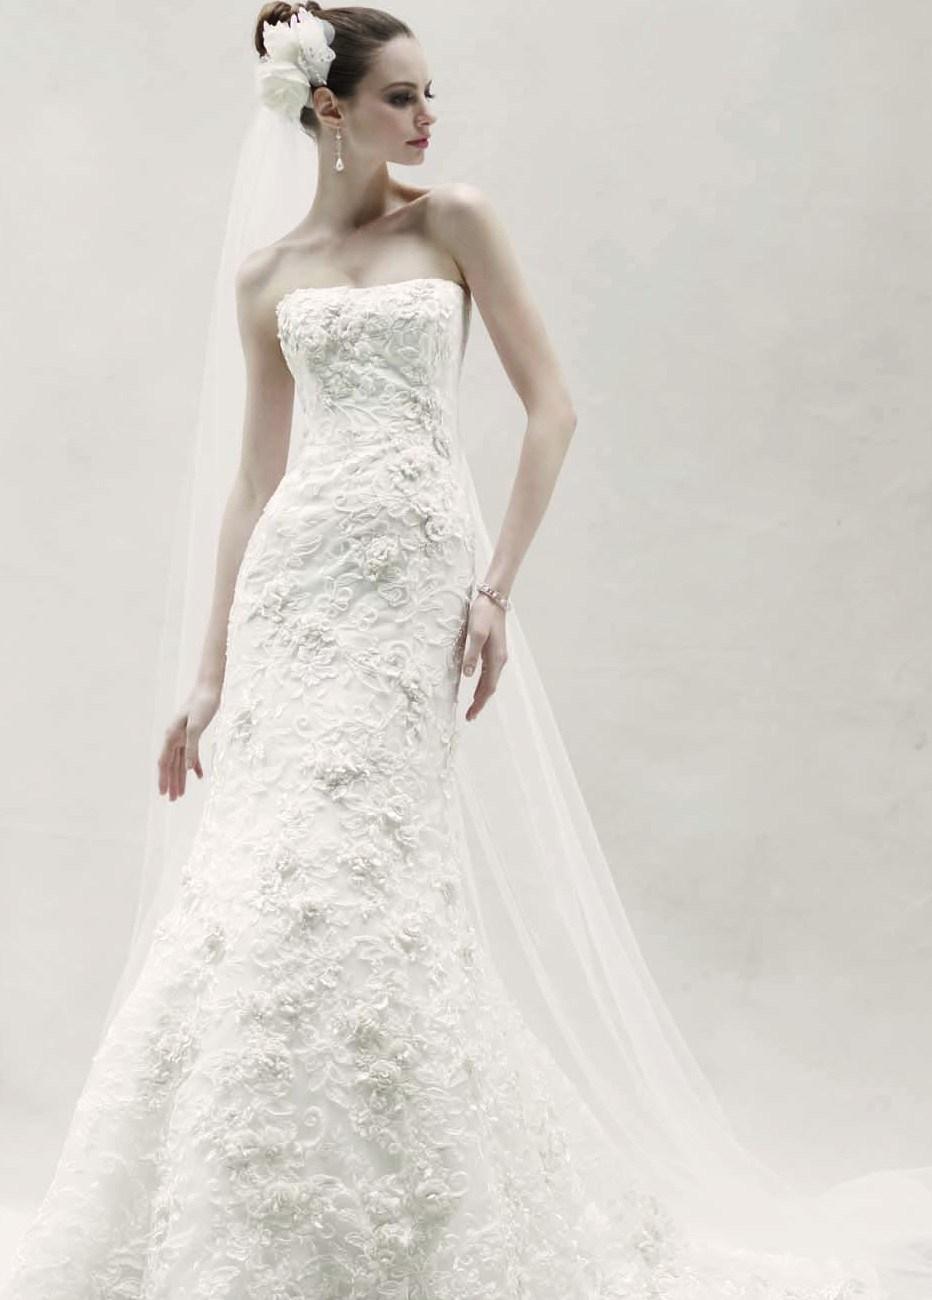 Oleg Cassini 2013 Spring Bridal Collection